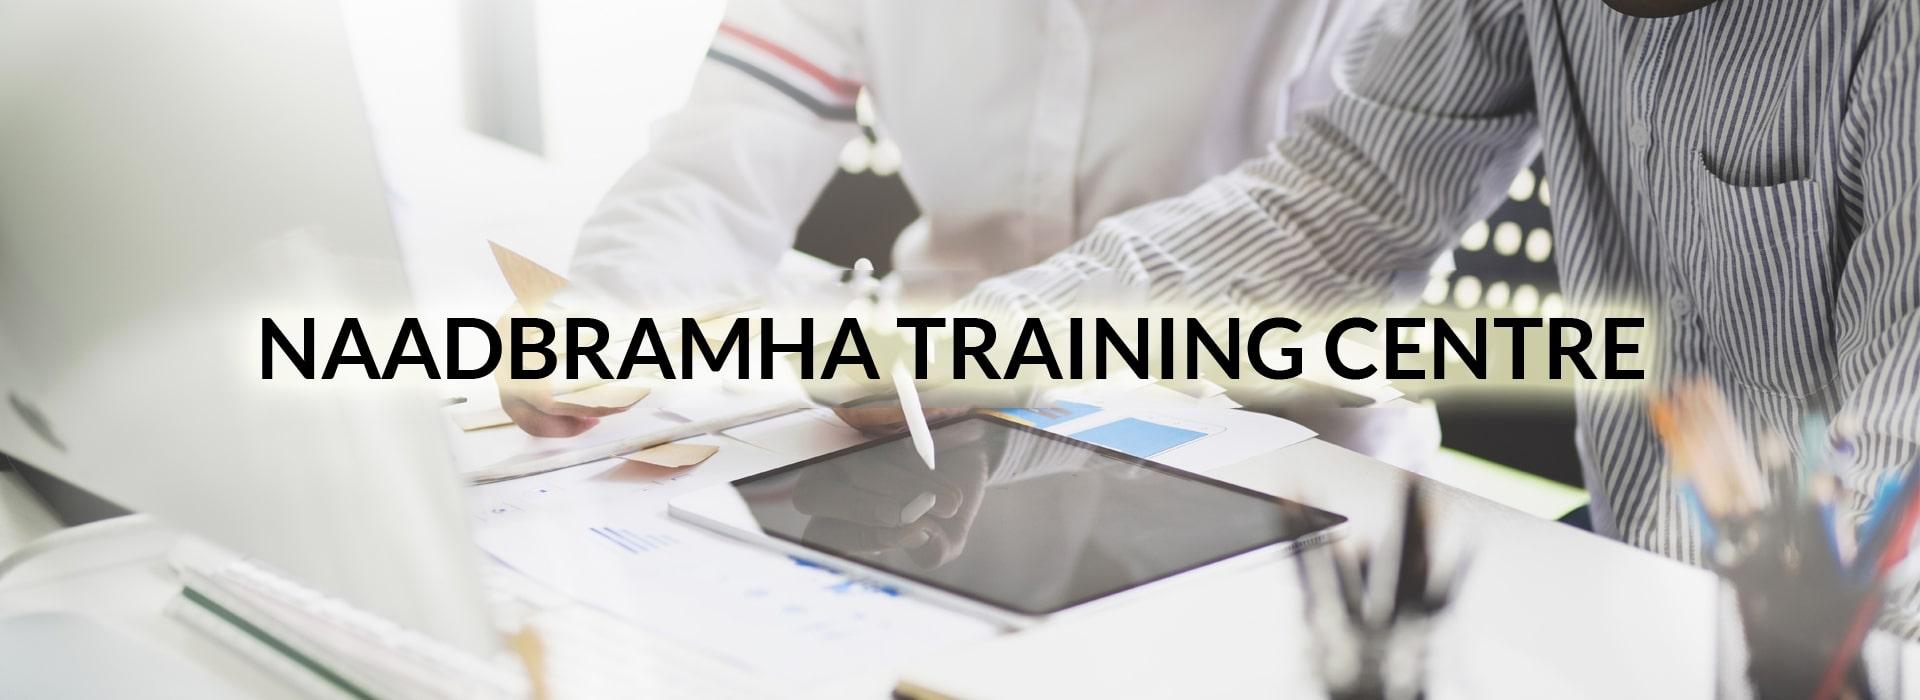 Naadbramha Training Centre